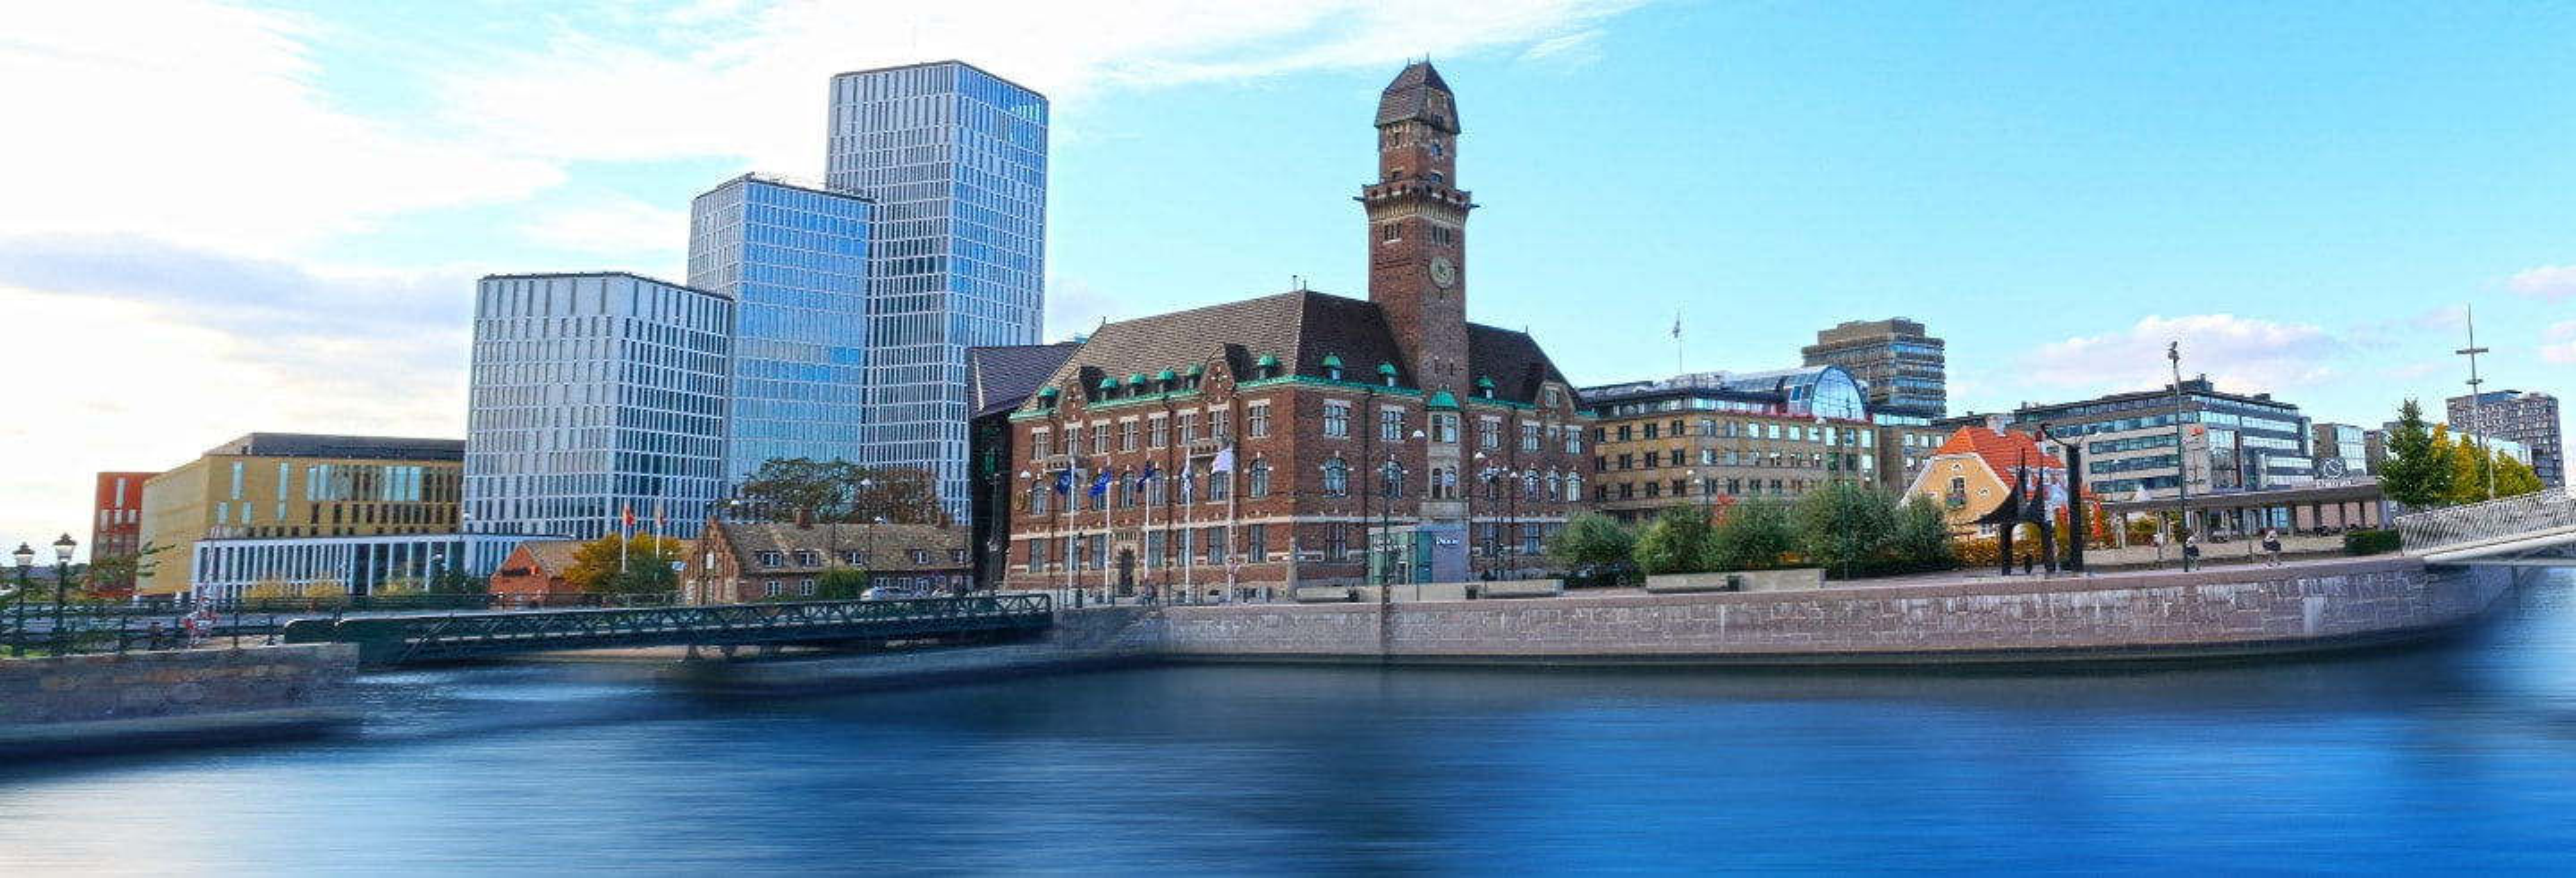 Visita guiada por Malmö